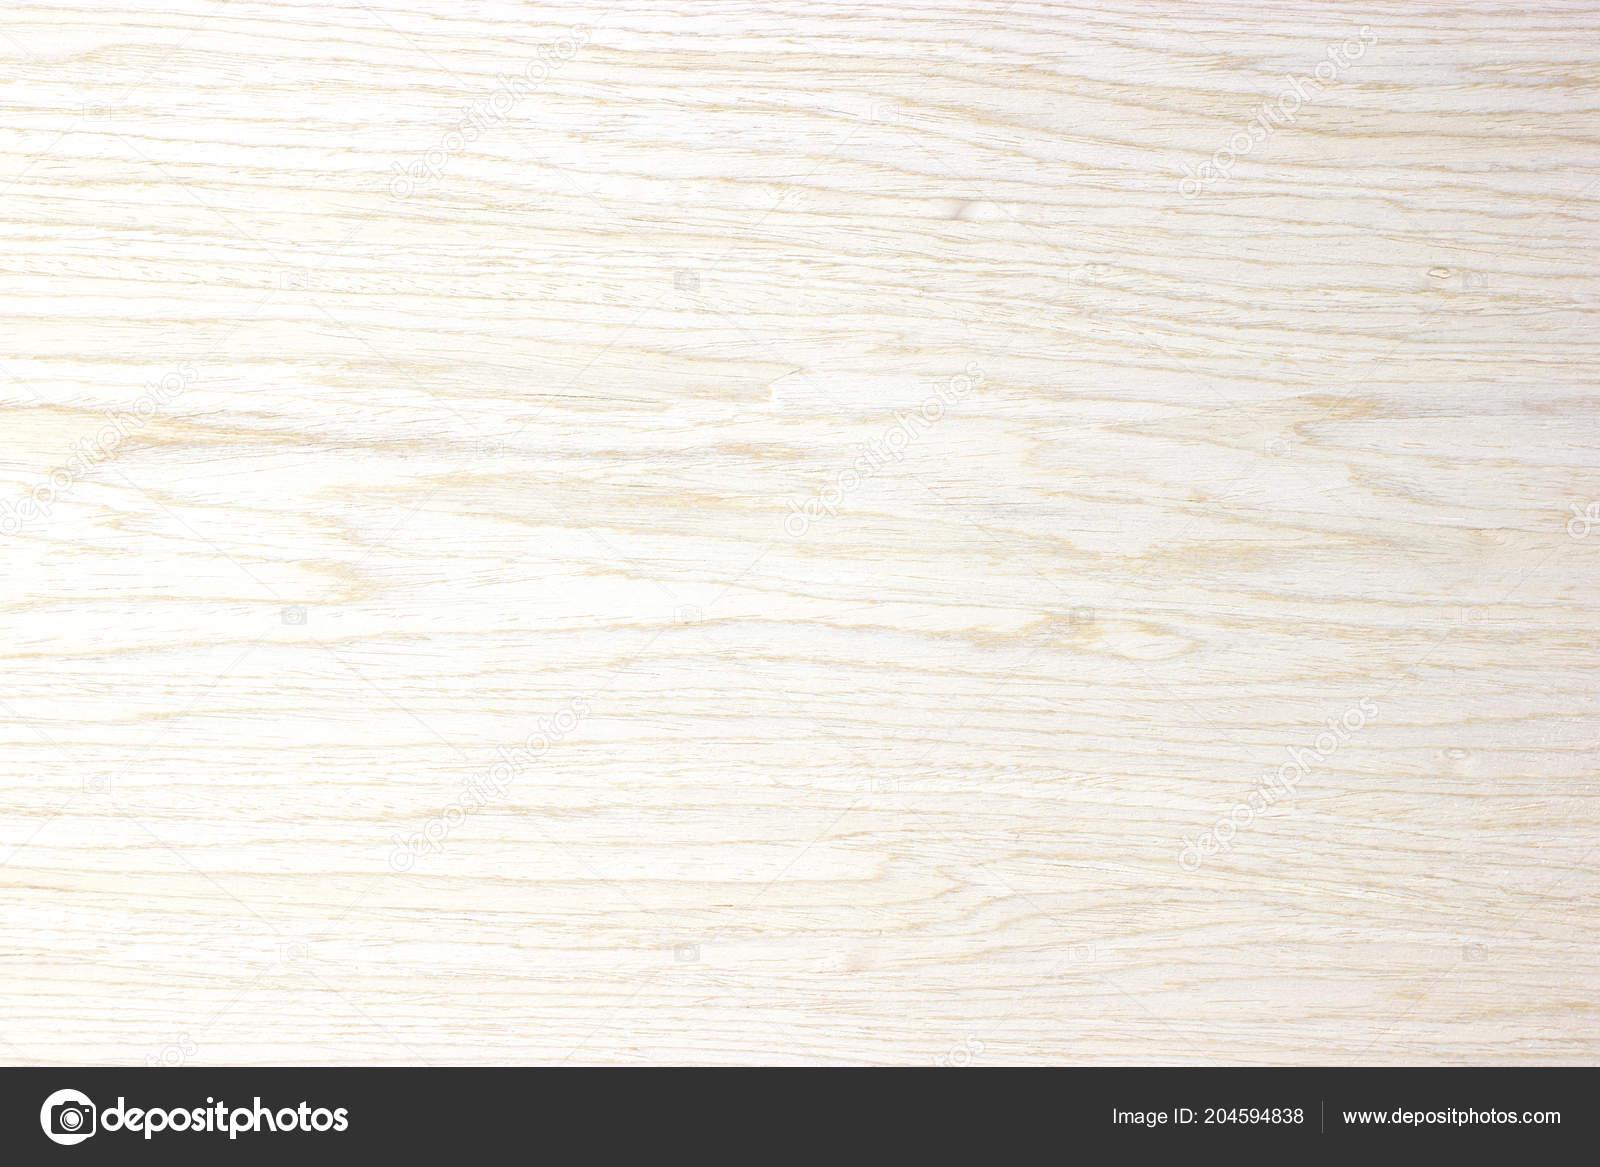 Legno Bianco Texture : Asse legno bianco texture multistrato sfondo u foto stock